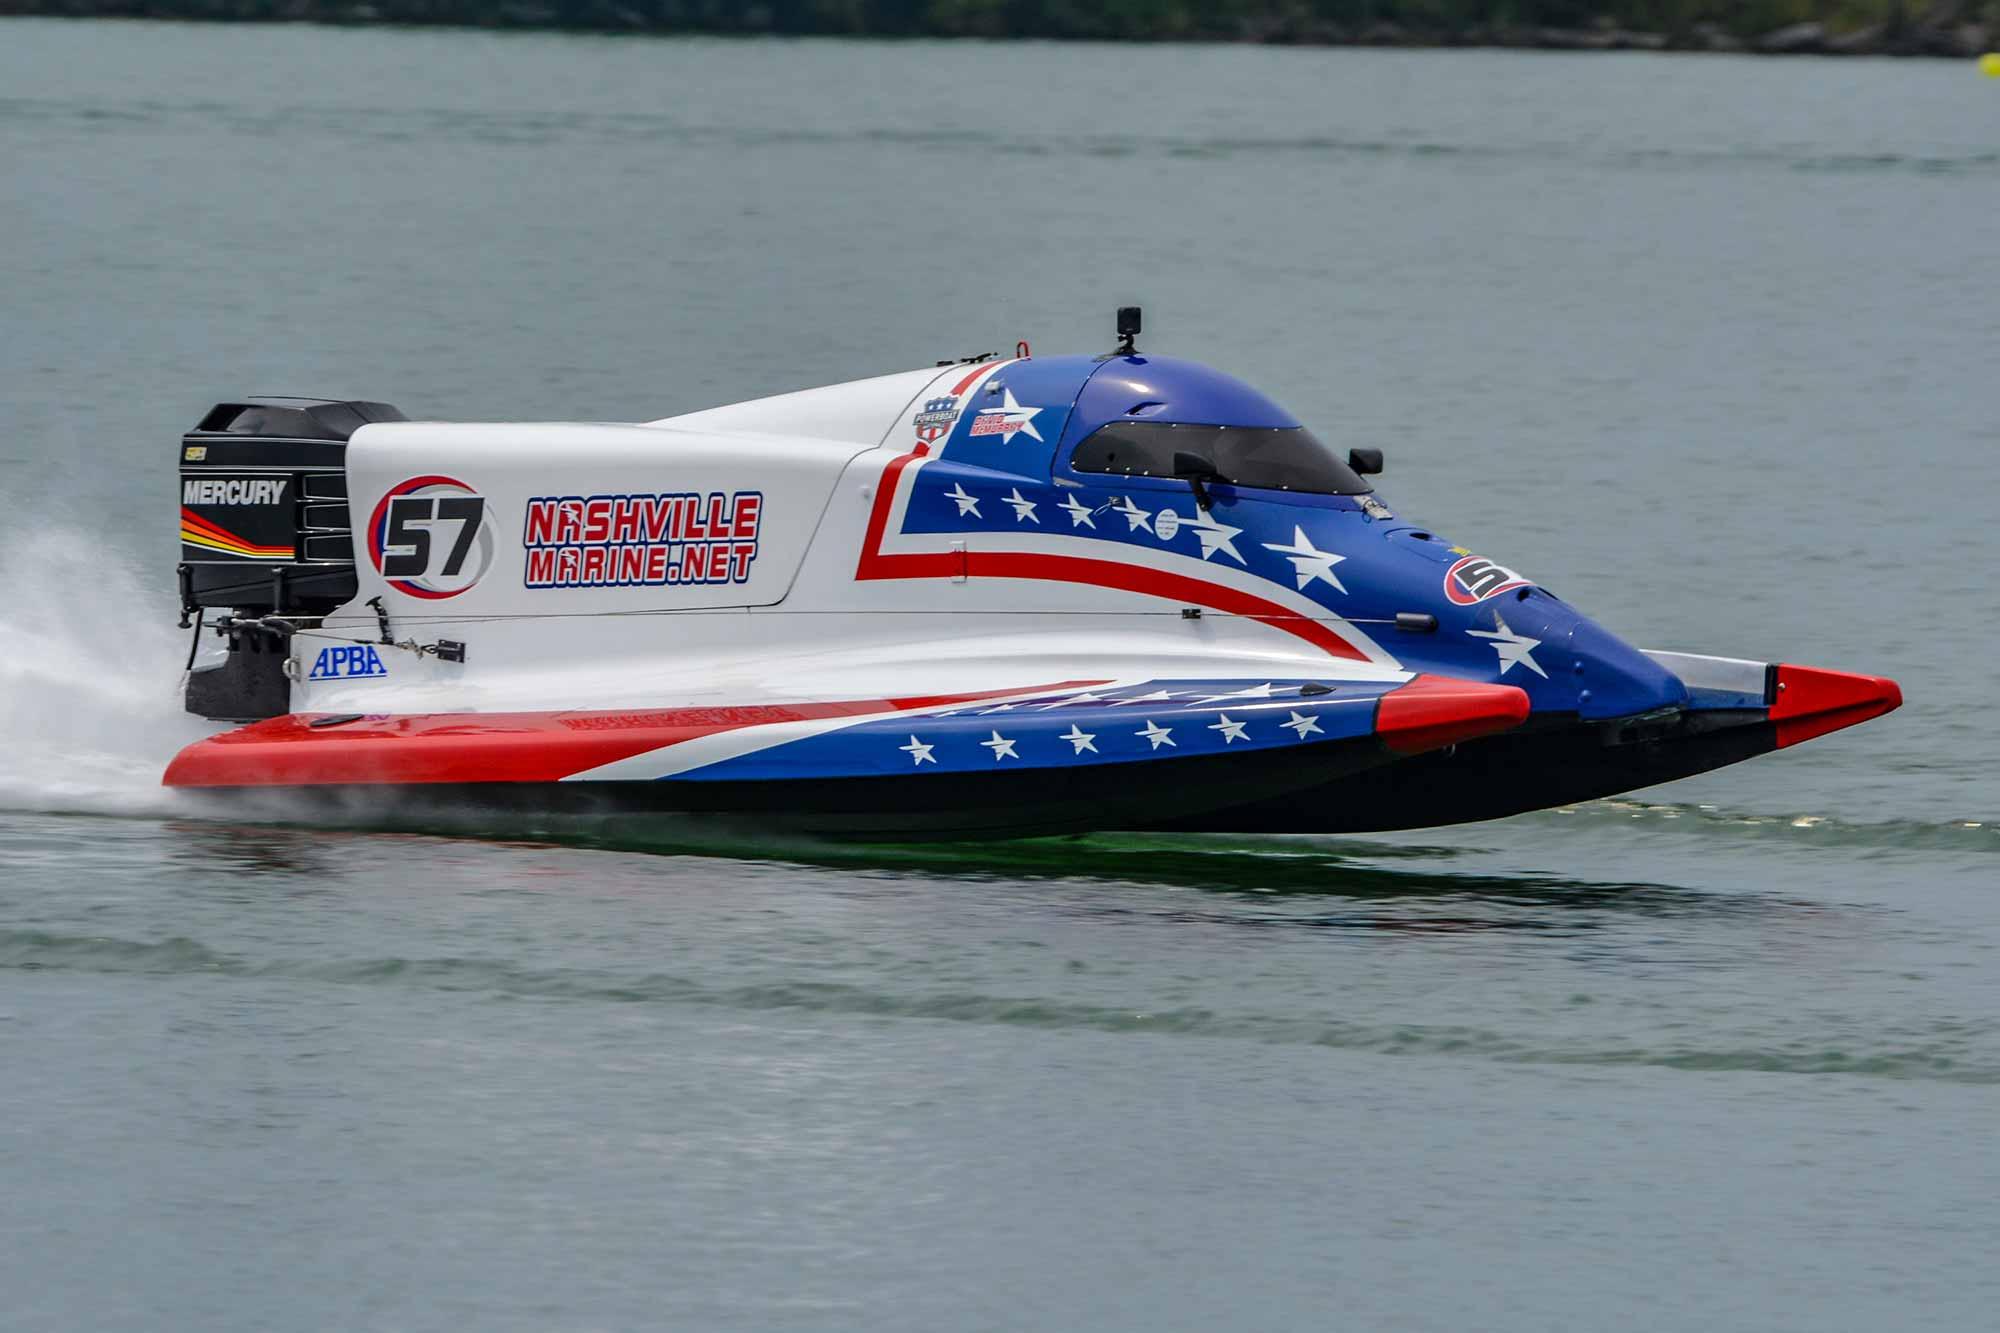 McMurray-Racing-Nashvill-Marine-2021-Springfield-F1-Race-29